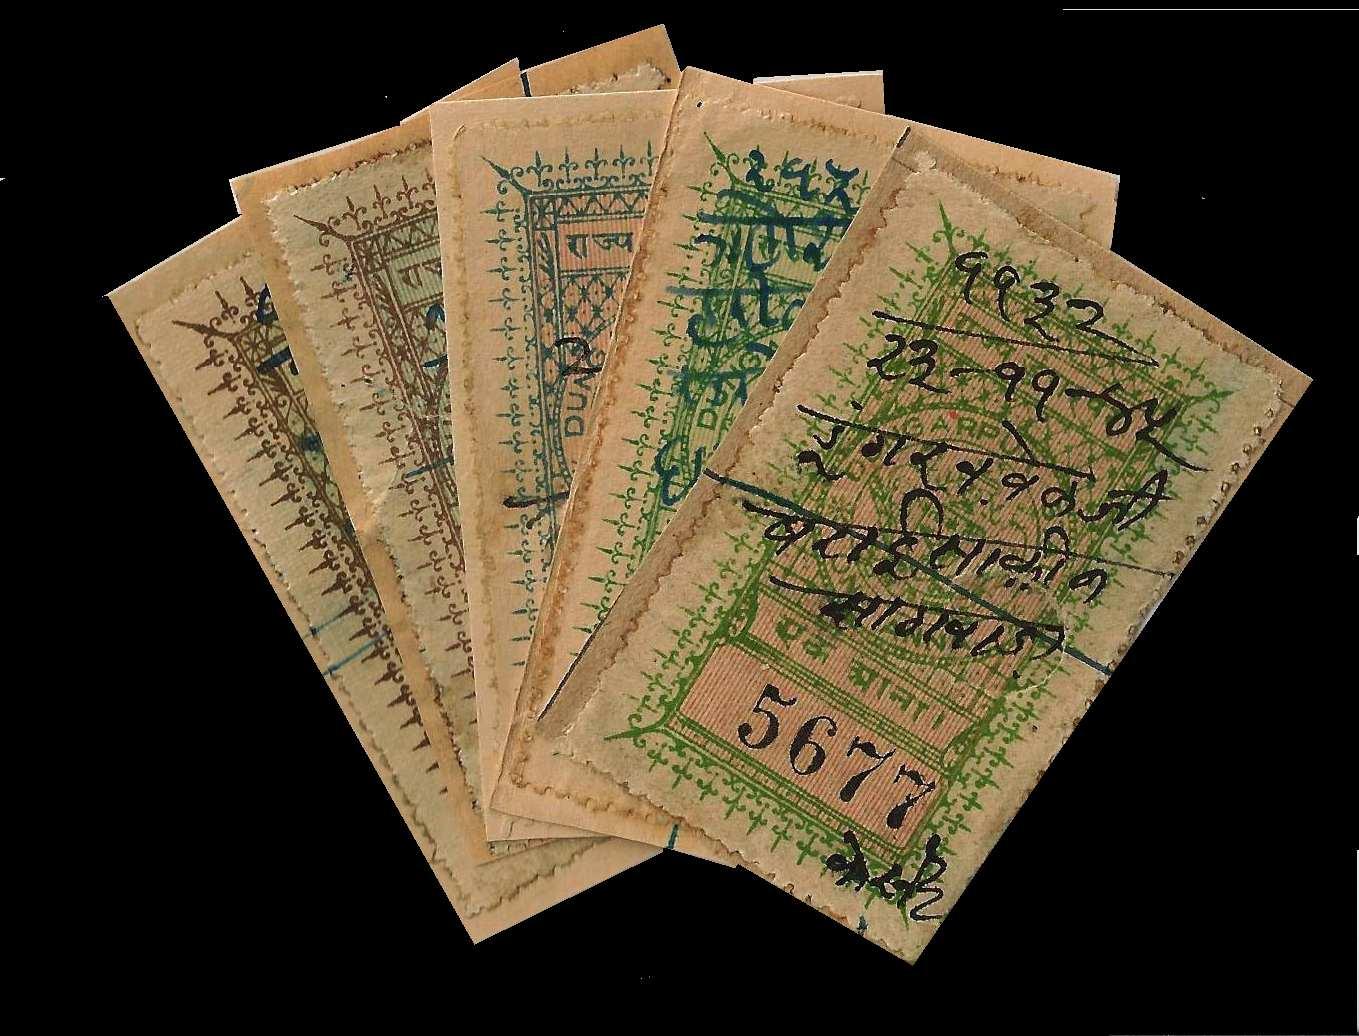 dungarpur etat indien timbres par pays timbres d 39 asie philatema. Black Bedroom Furniture Sets. Home Design Ideas